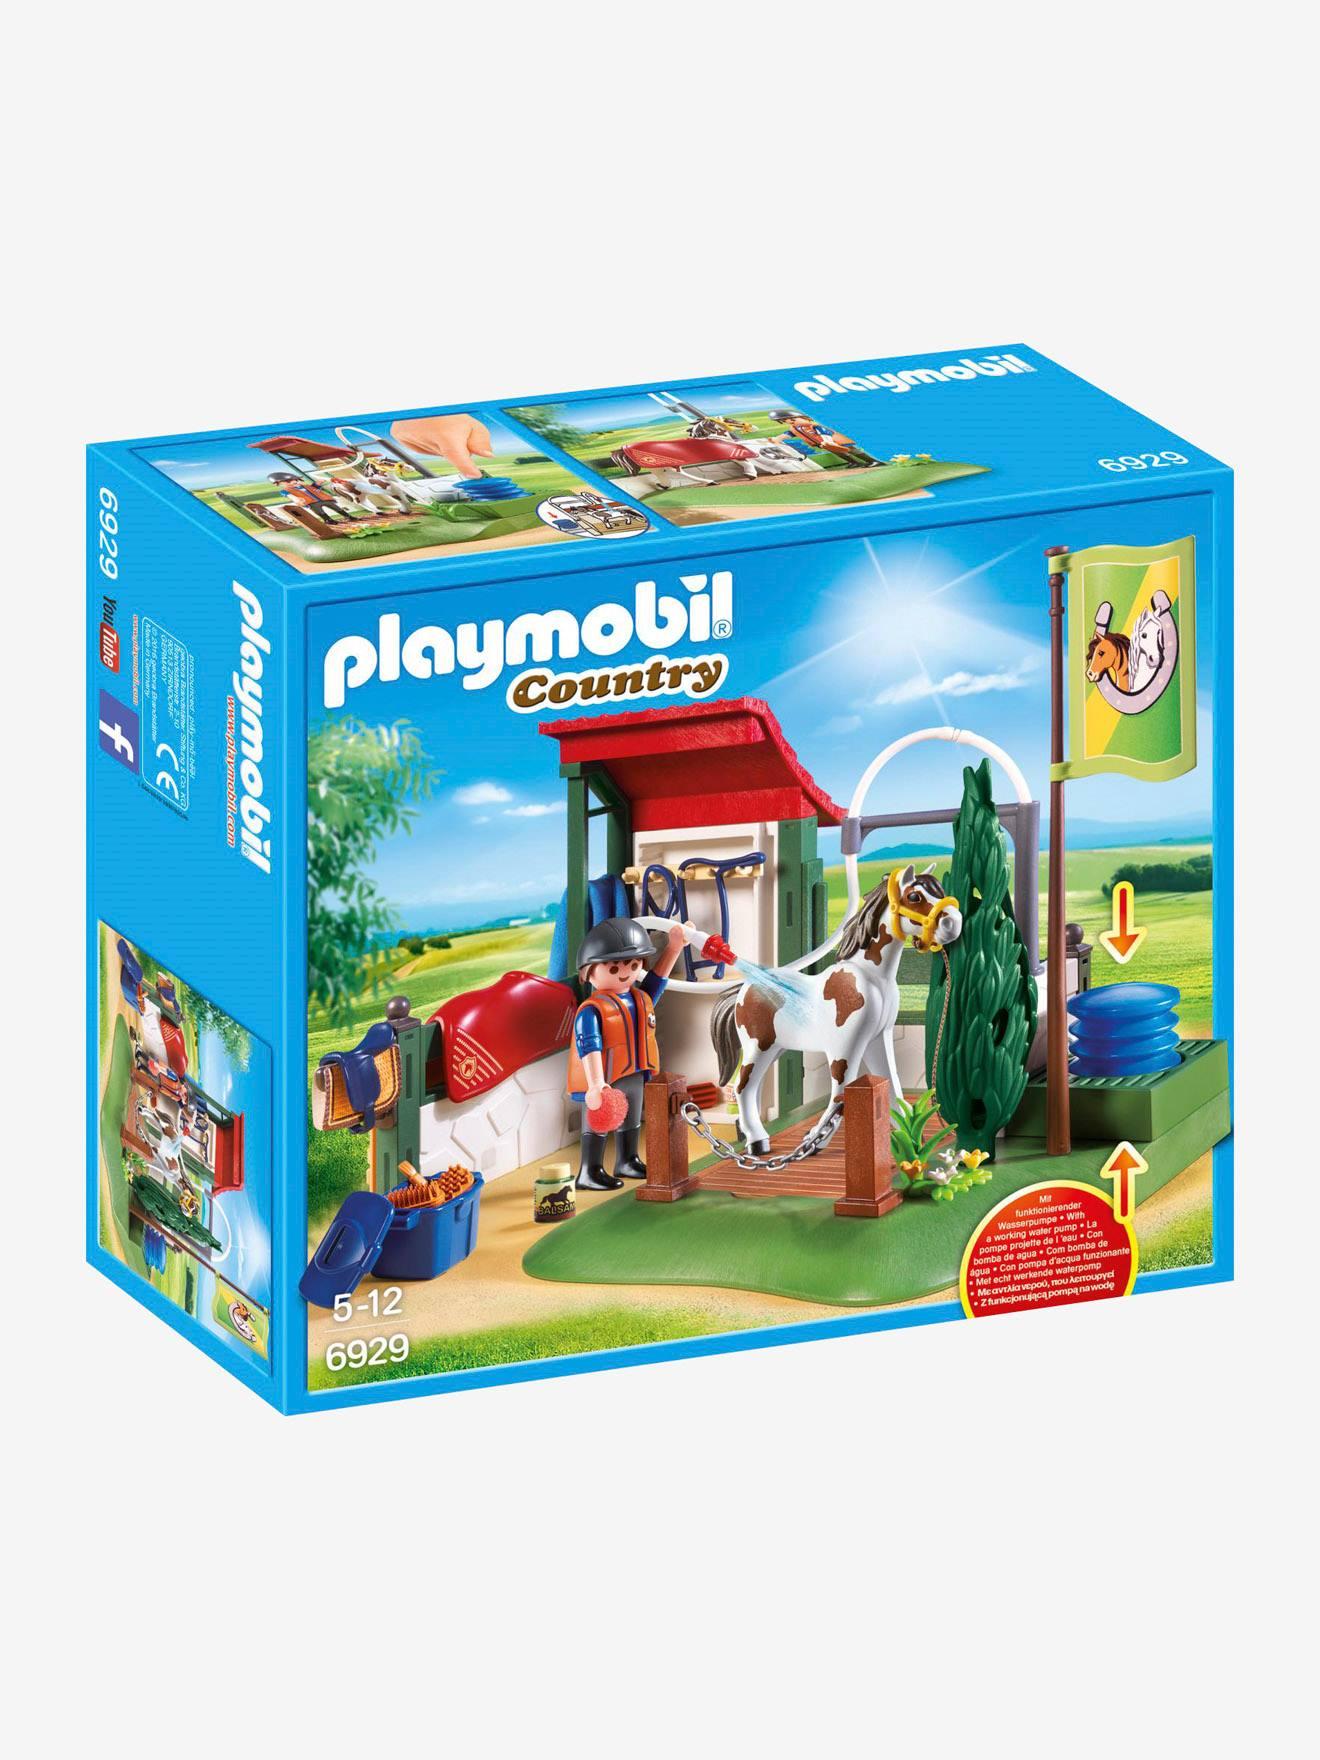 Claro Set Con Limpieza De Para Caballos 6929 Playmobil Liso Beige EbeWDH2IY9